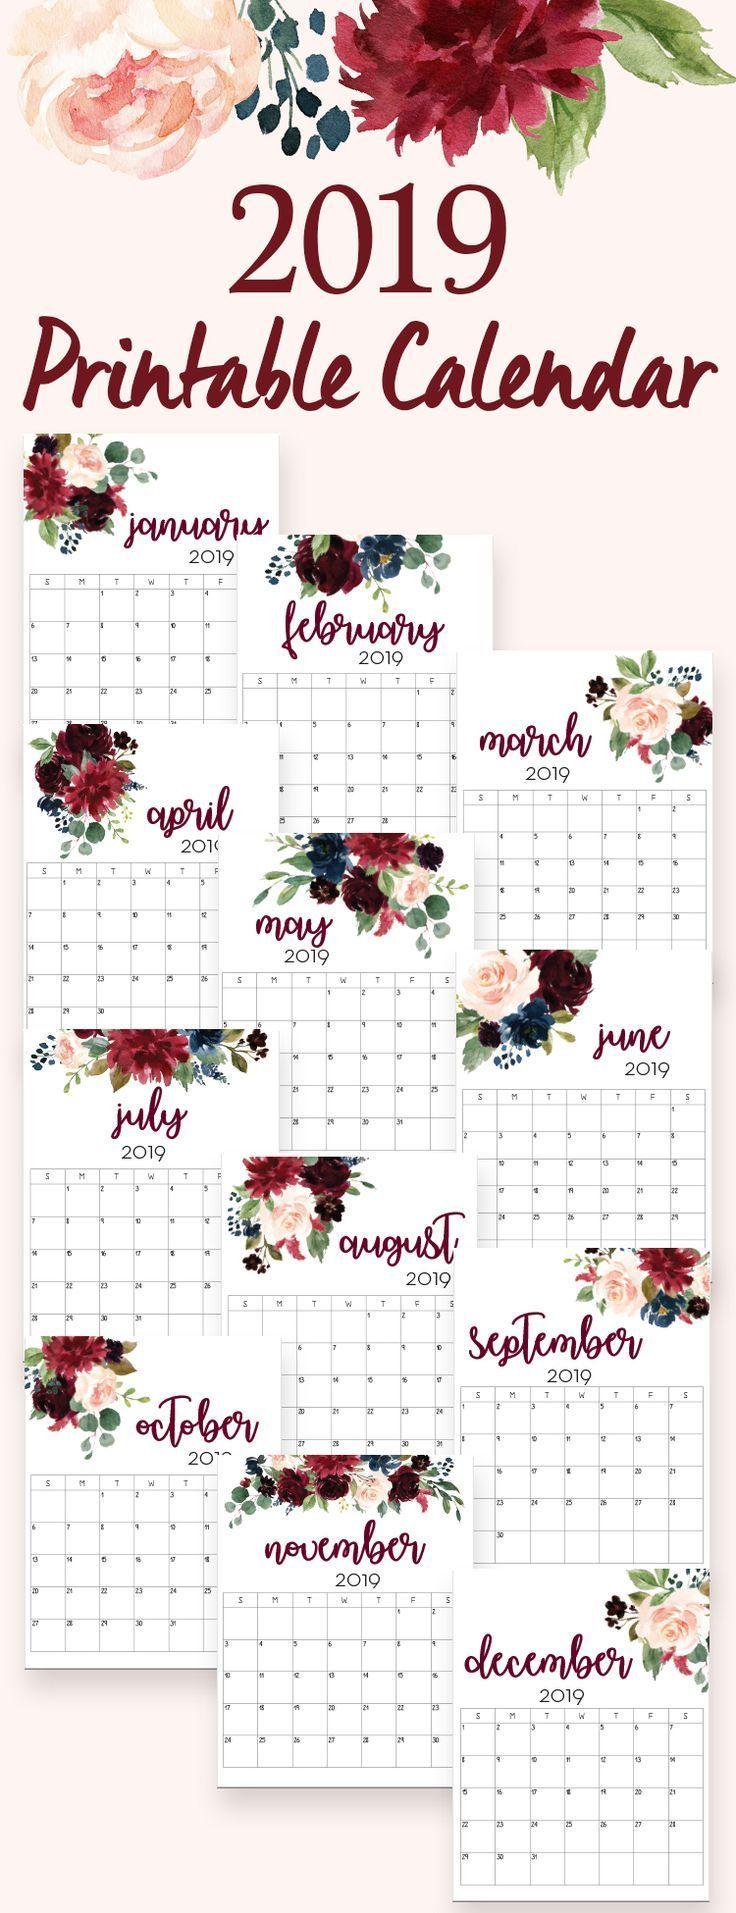 2019 calendar, 2019 calendars, 2019 printable calendars, printable calendar,  free printables, free downloadables, printable downloads, calendars 2019,  ...